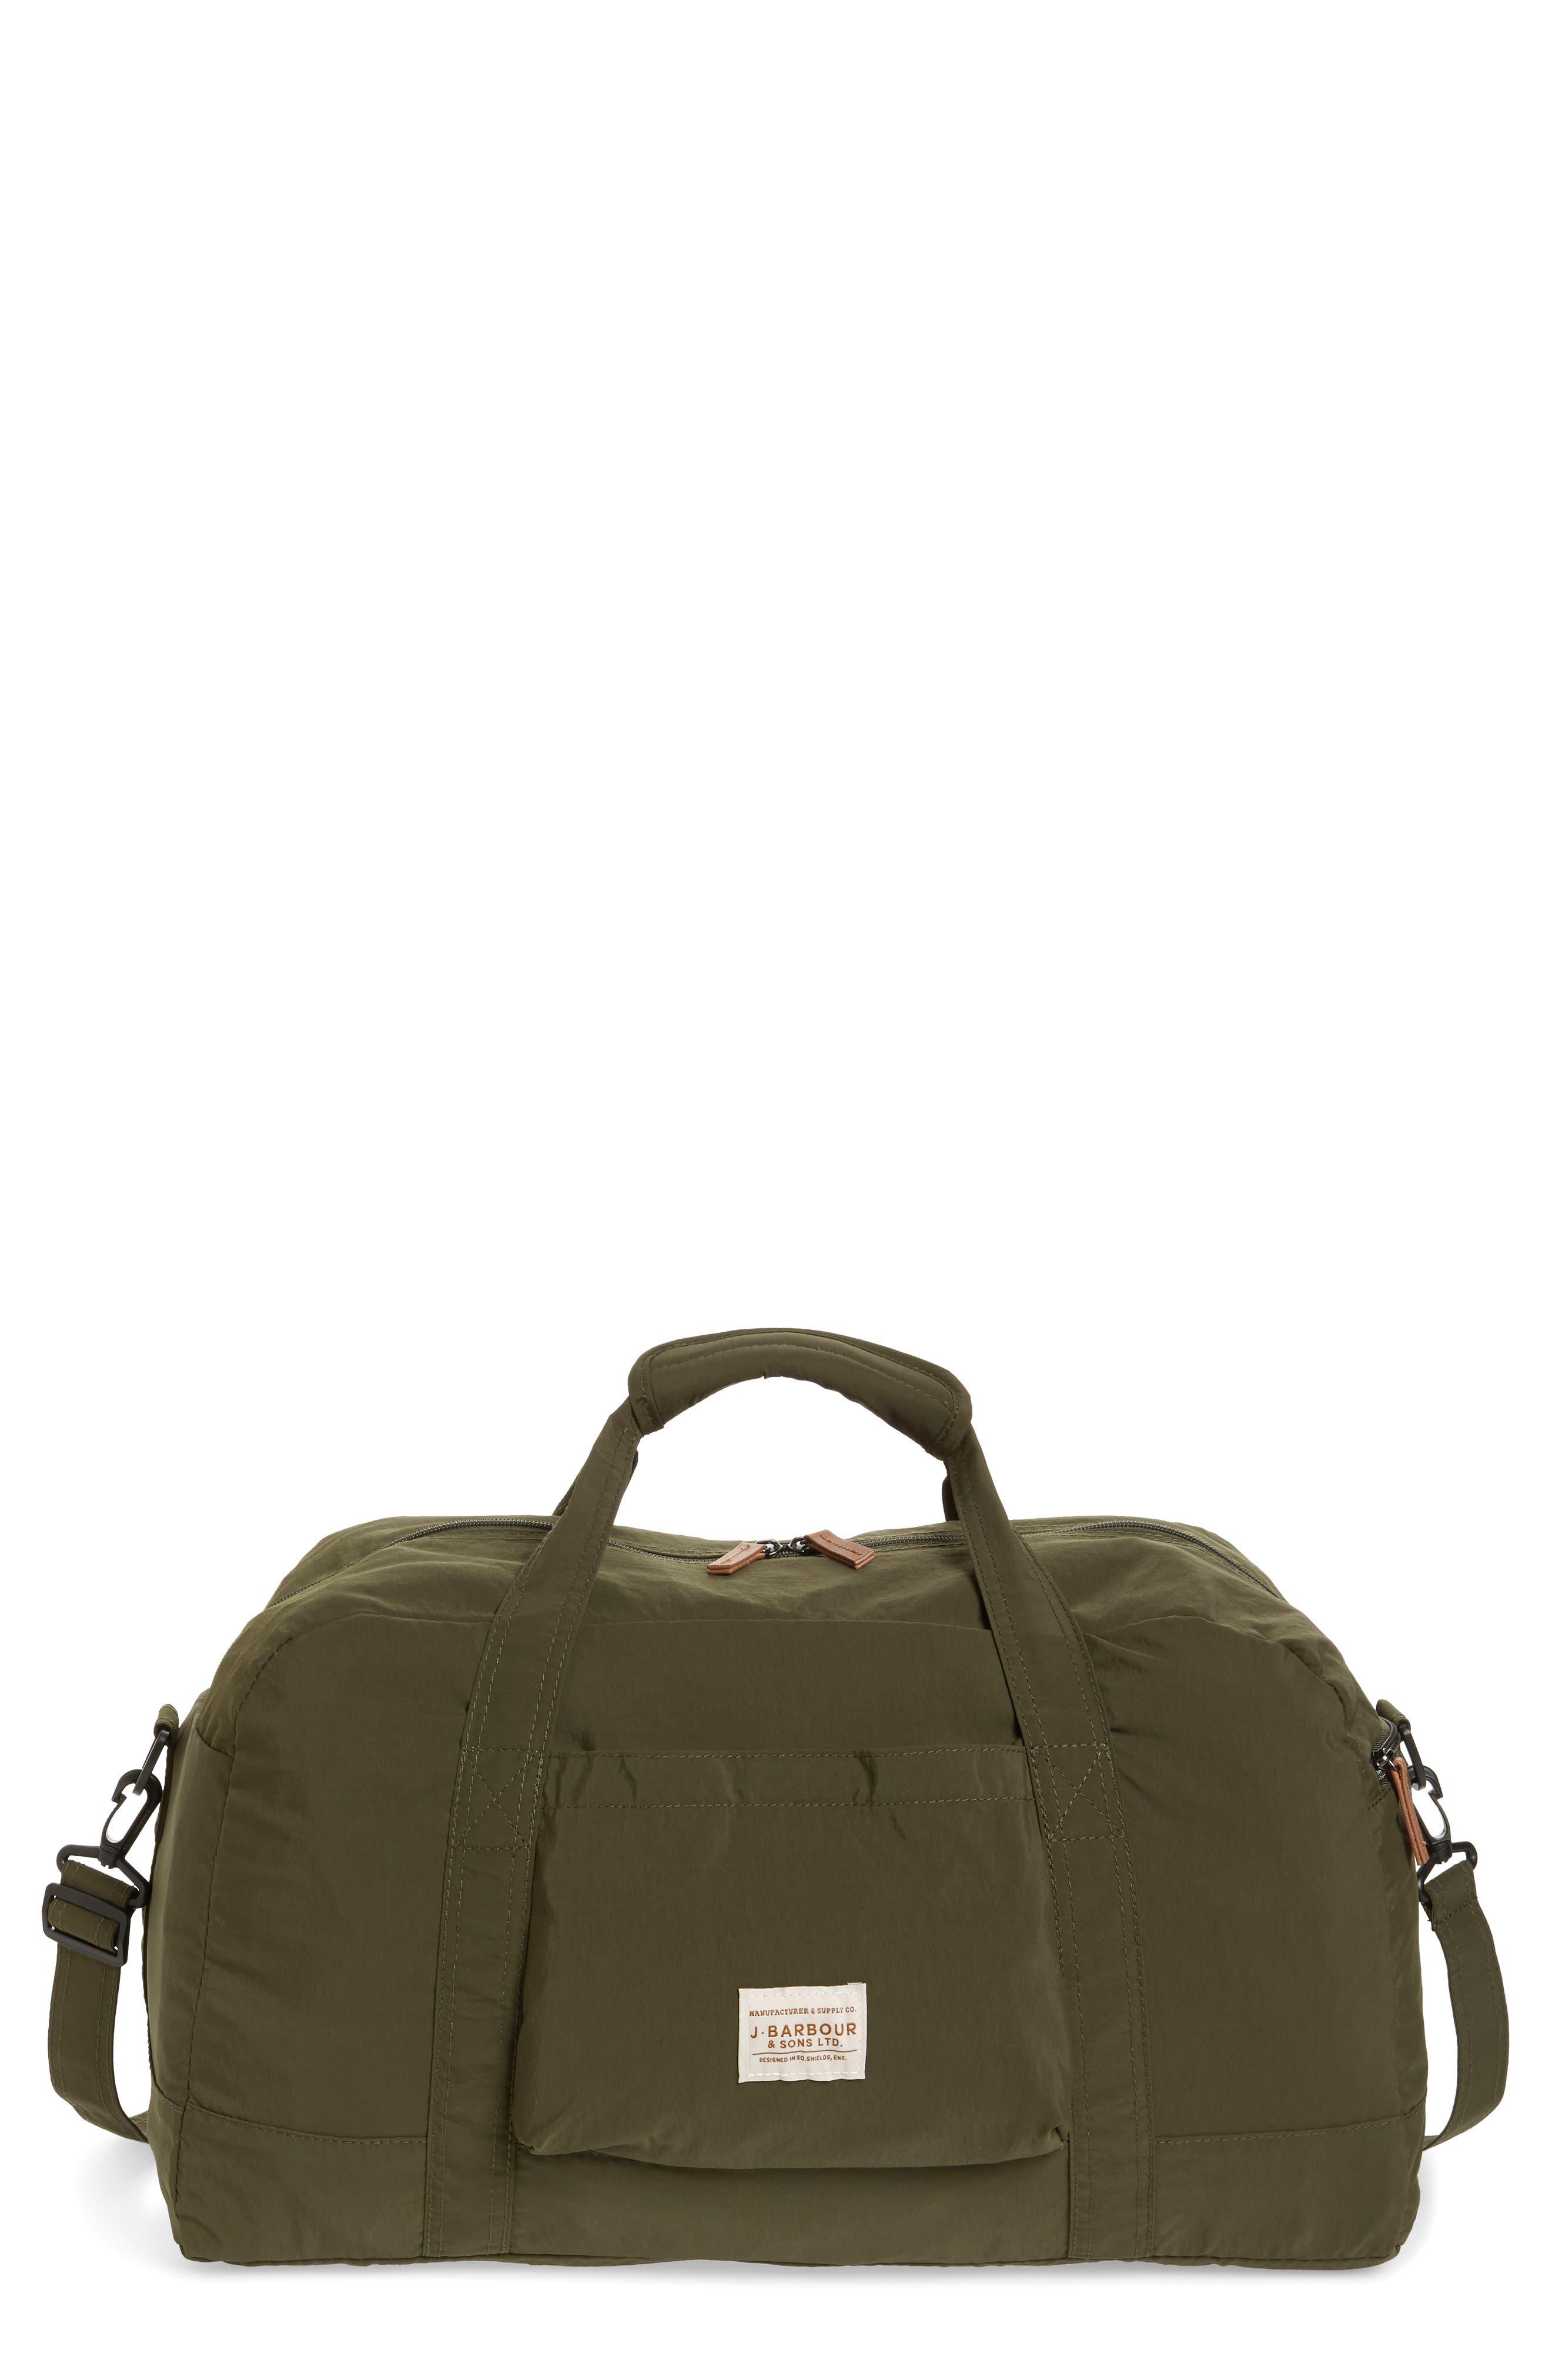 Banchory Packable Duffle Bag, Main, color, DARK GREEN